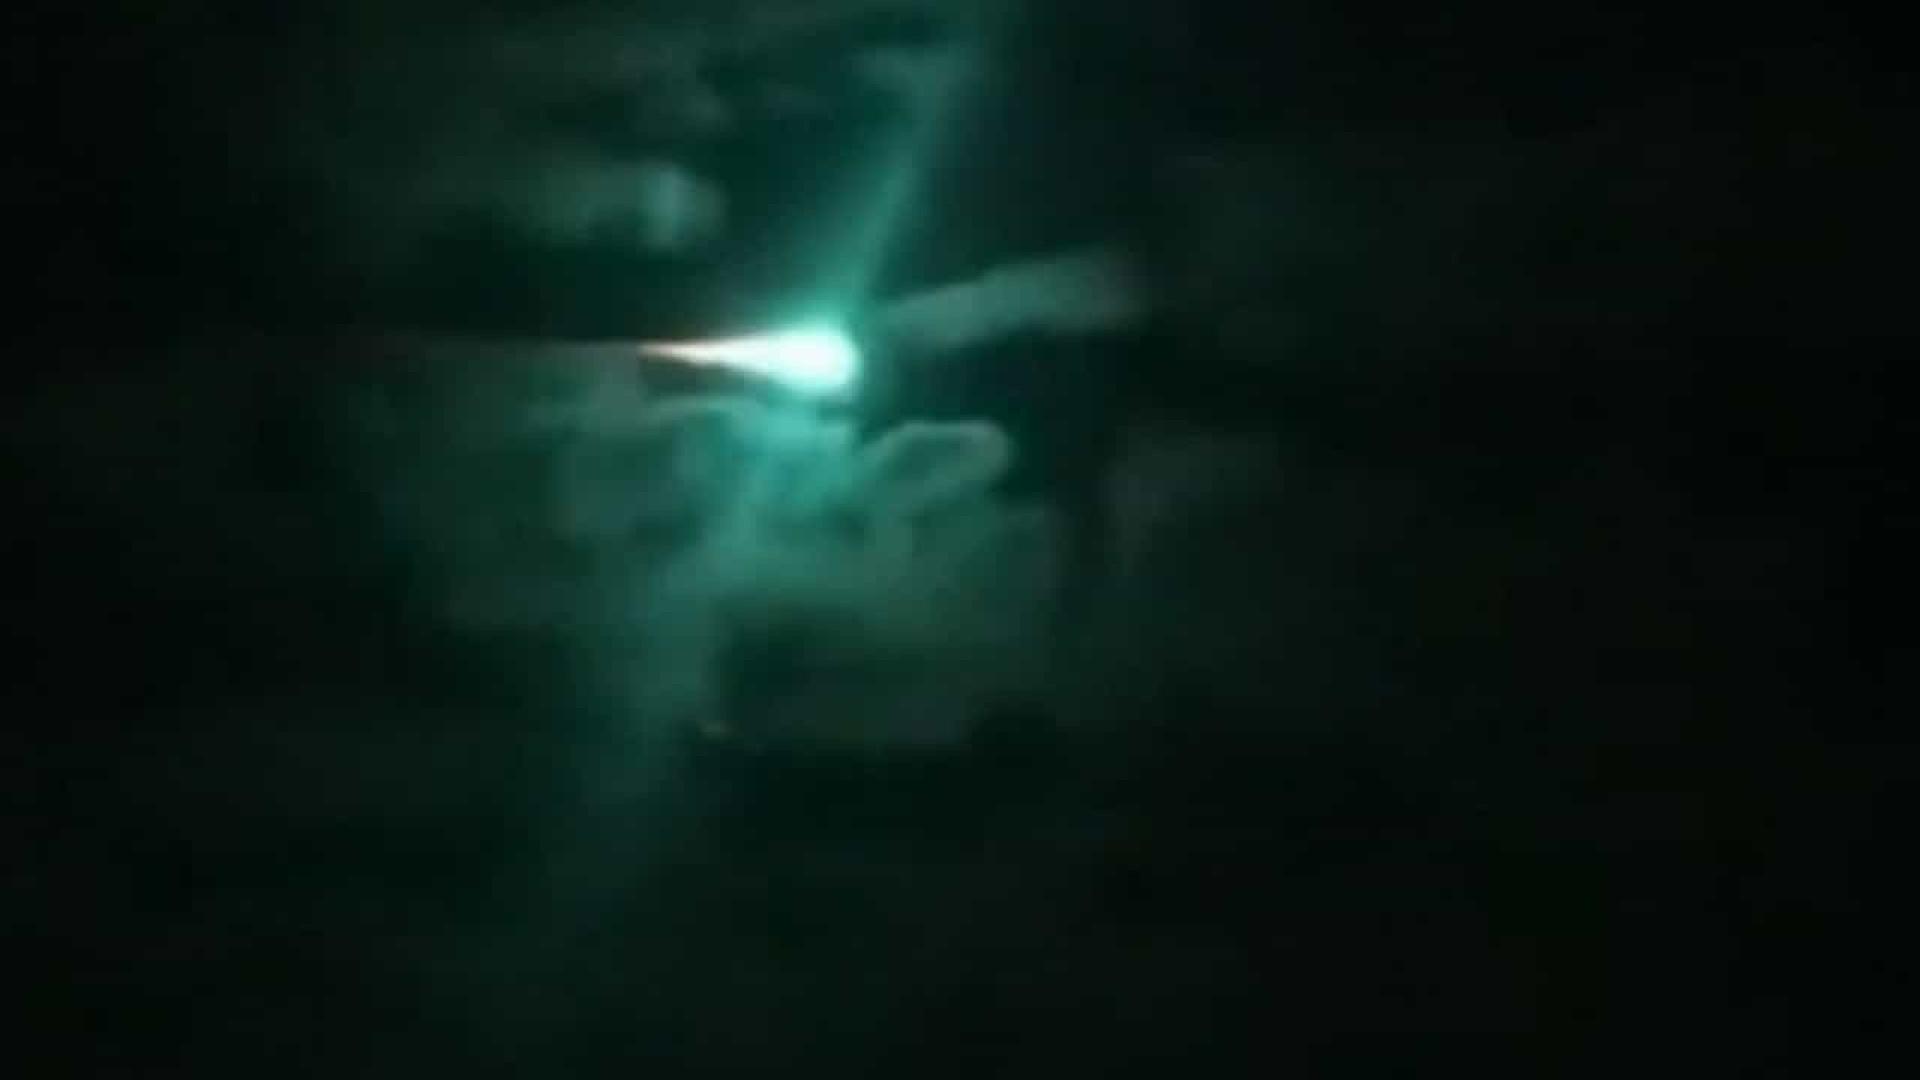 Curioso asteroide iluminou de verde o céu da Austrália